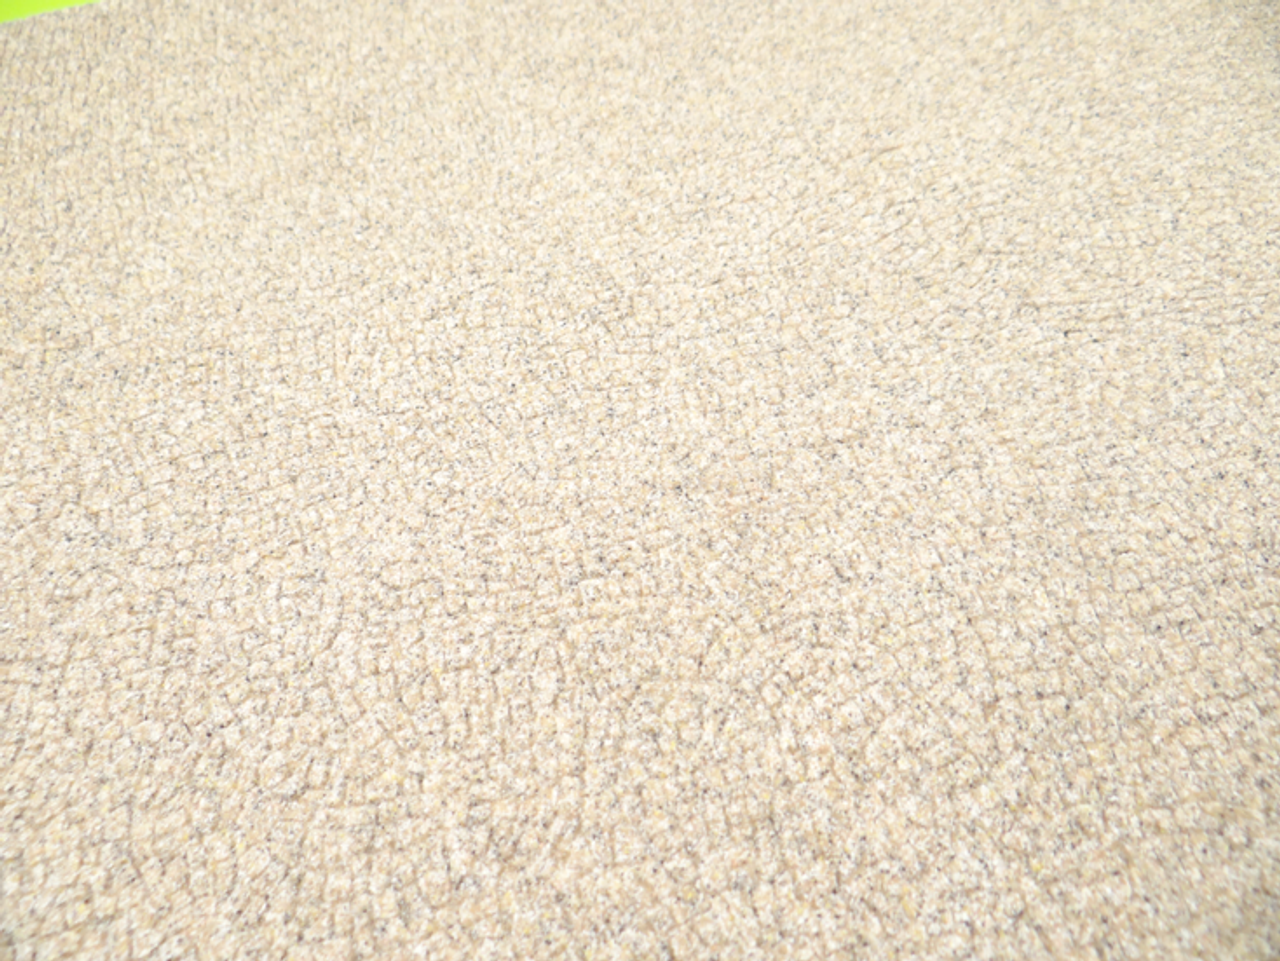 1114-15/28mm Cobblestone Sandstone 12x12 Mat